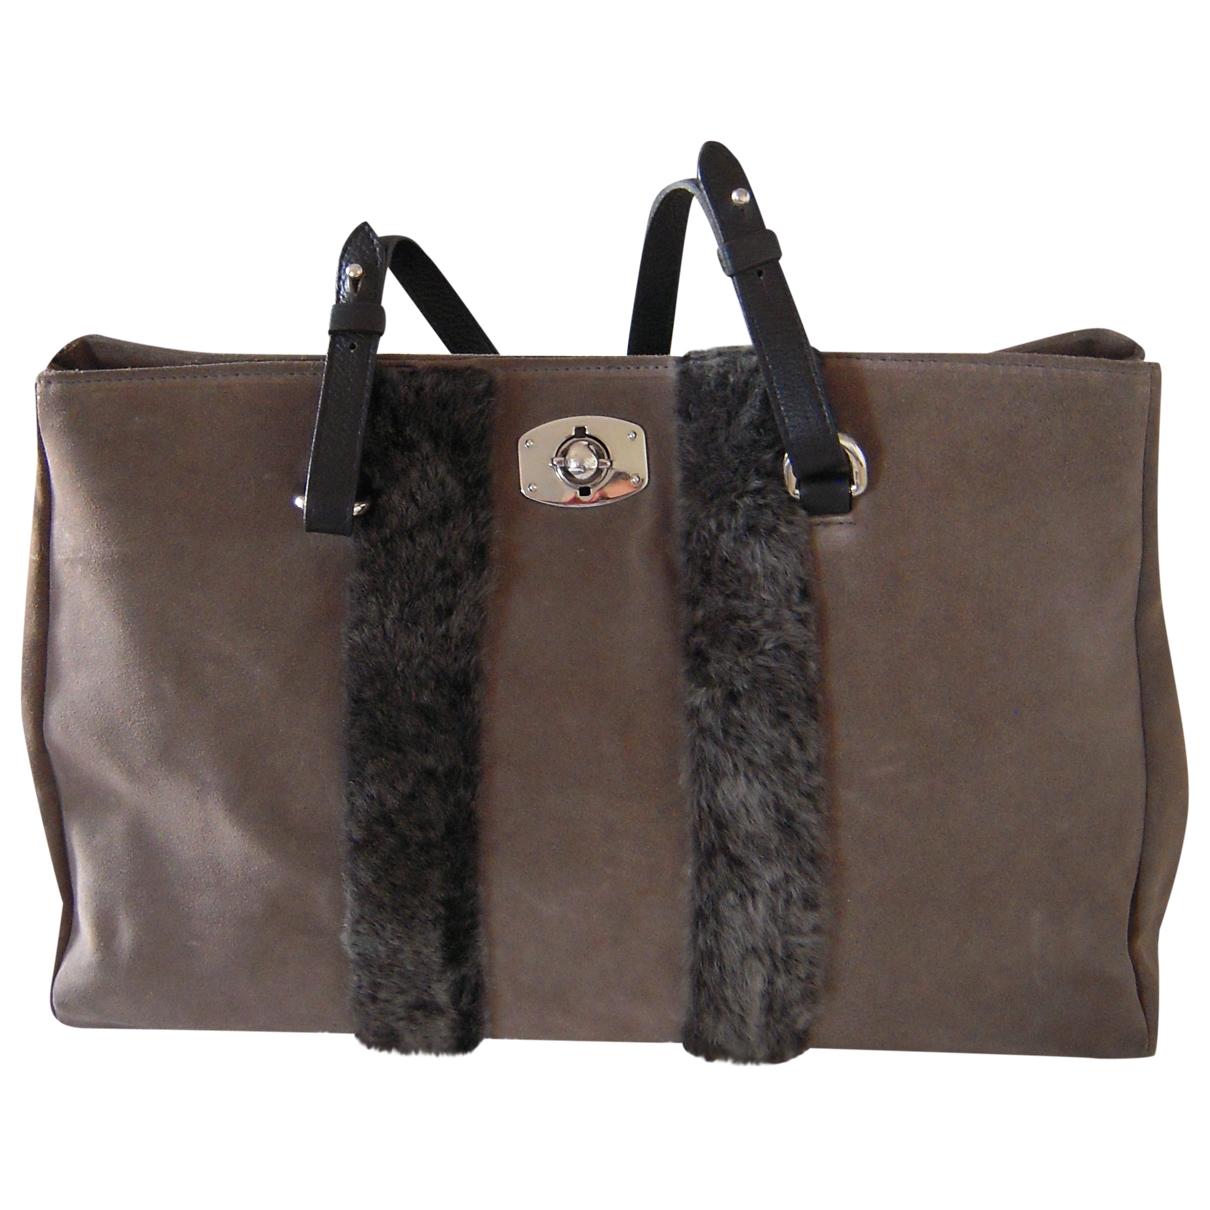 Furla \N Handtasche in  Grau Veloursleder